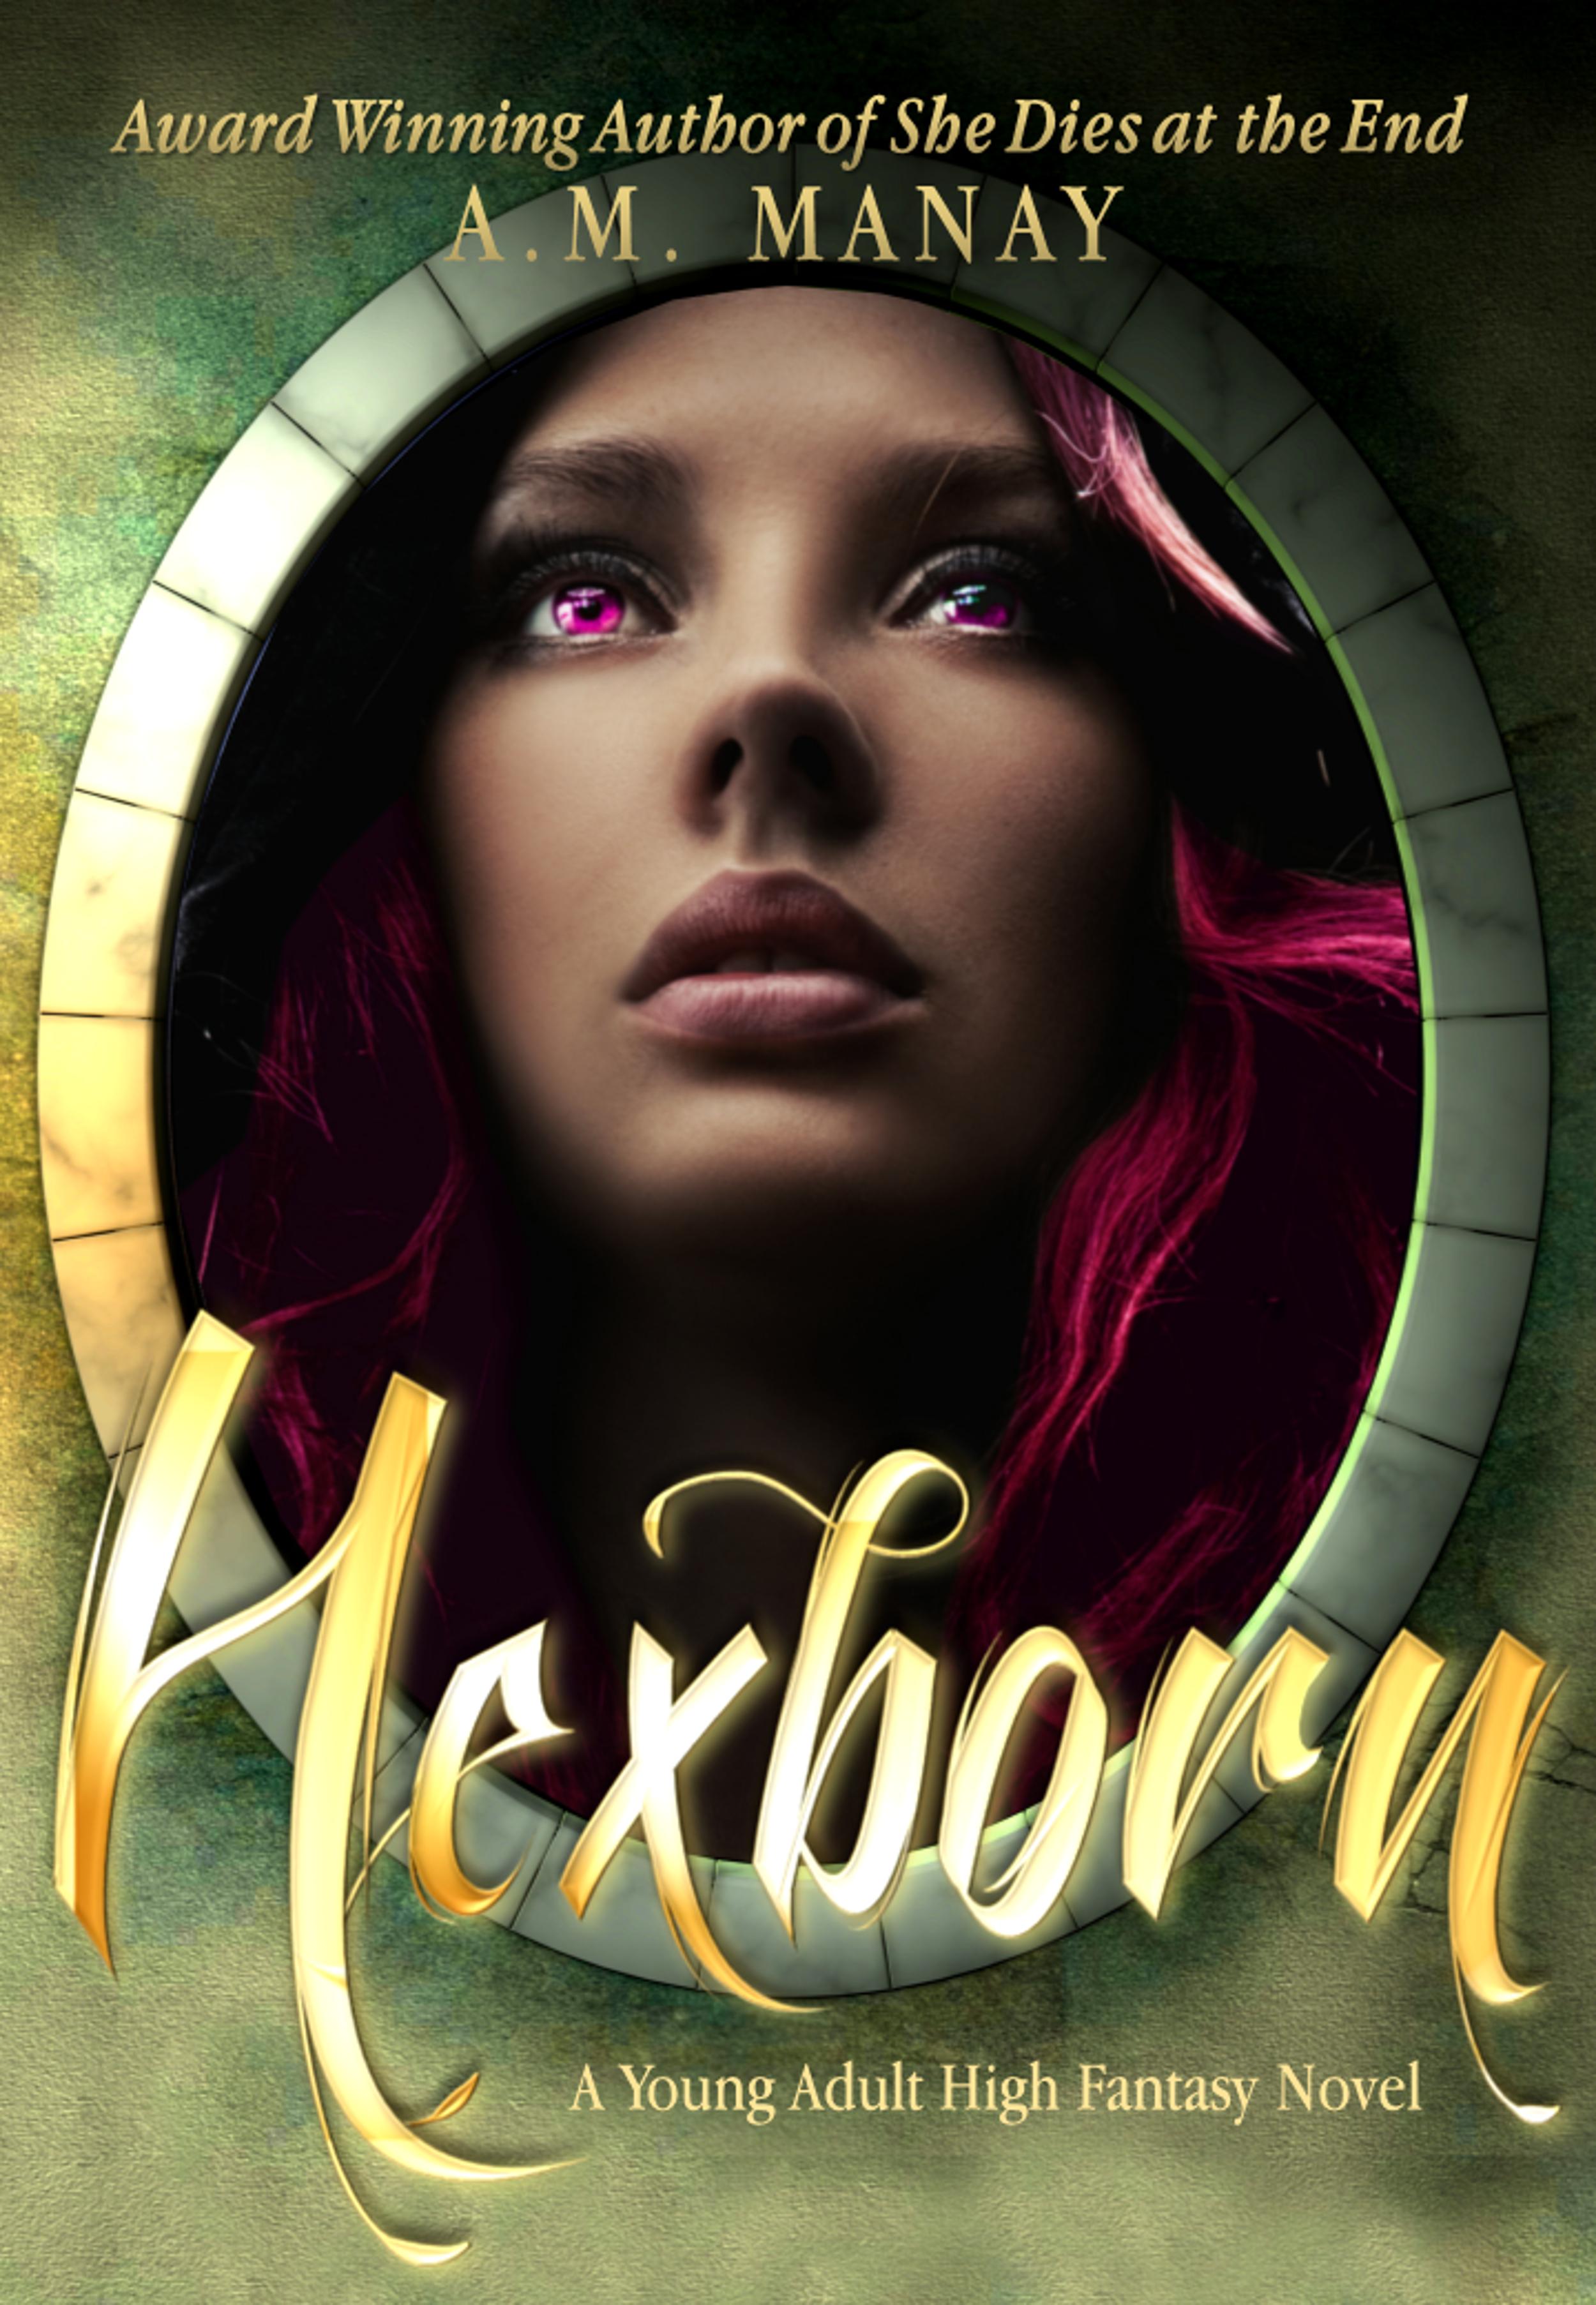 Hexborn Cover